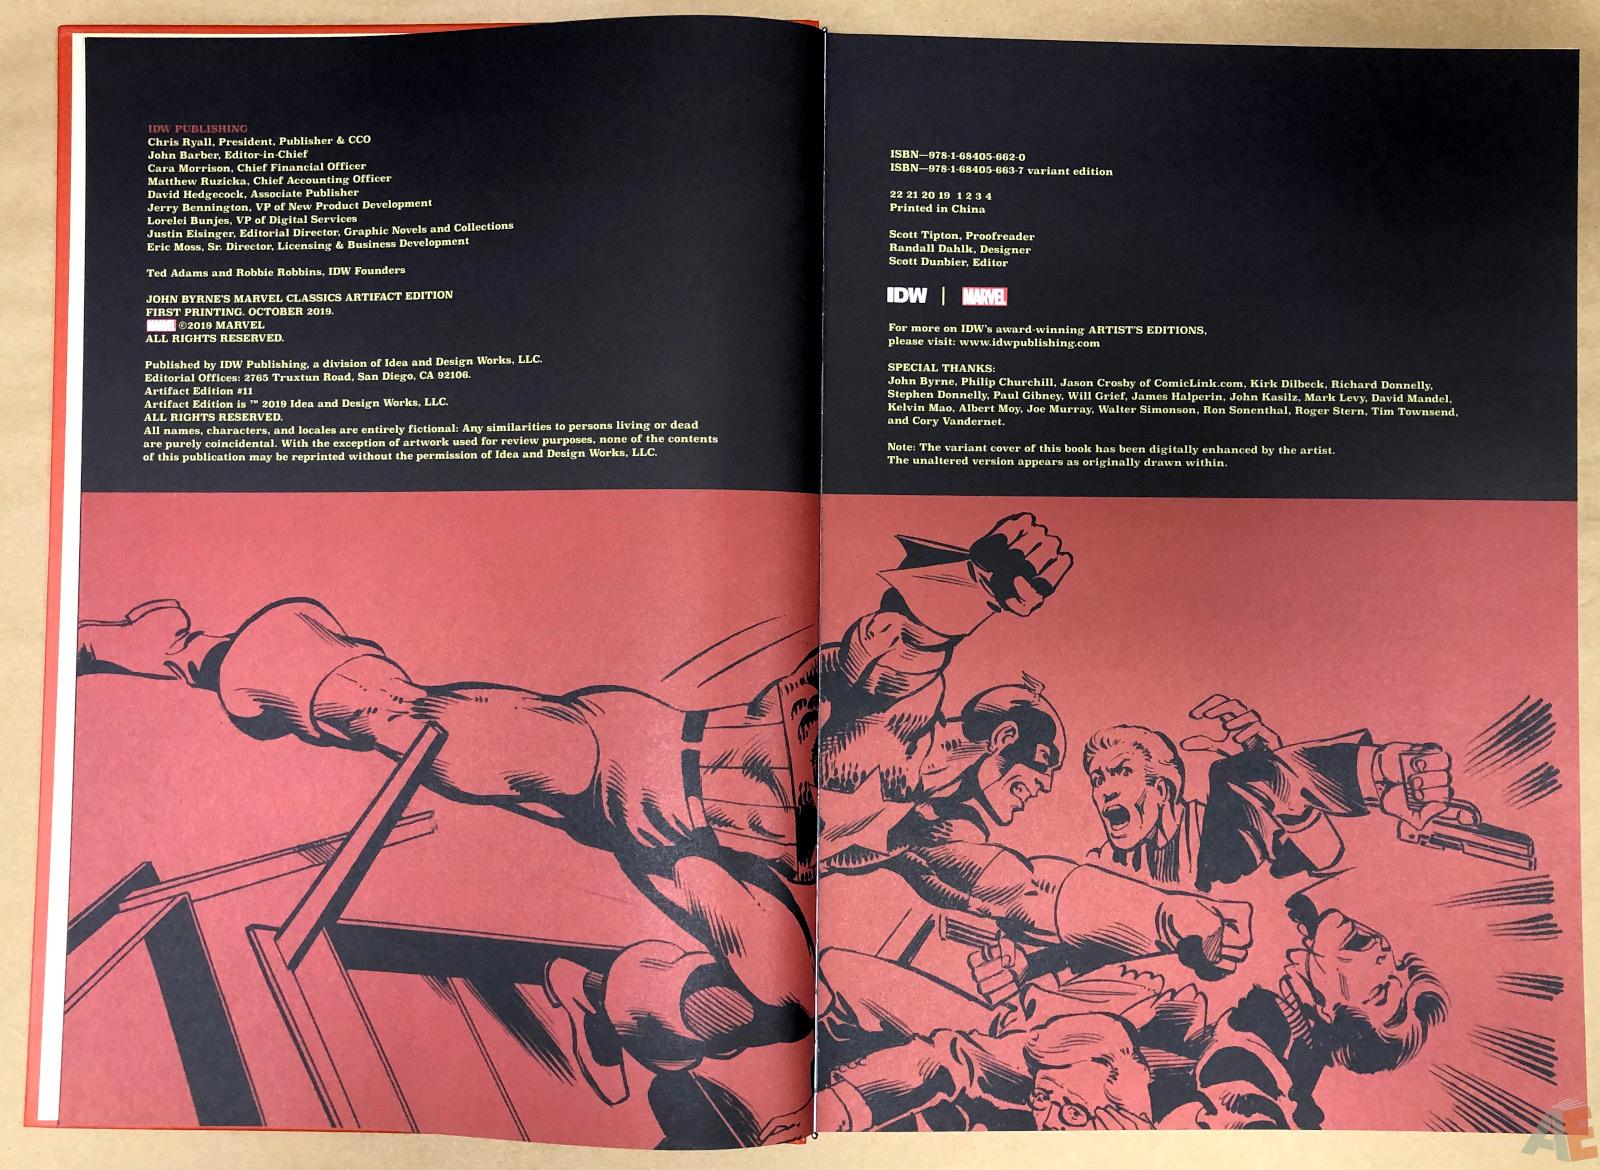 John Byrne's Marvel Classics Artifact Edition 4